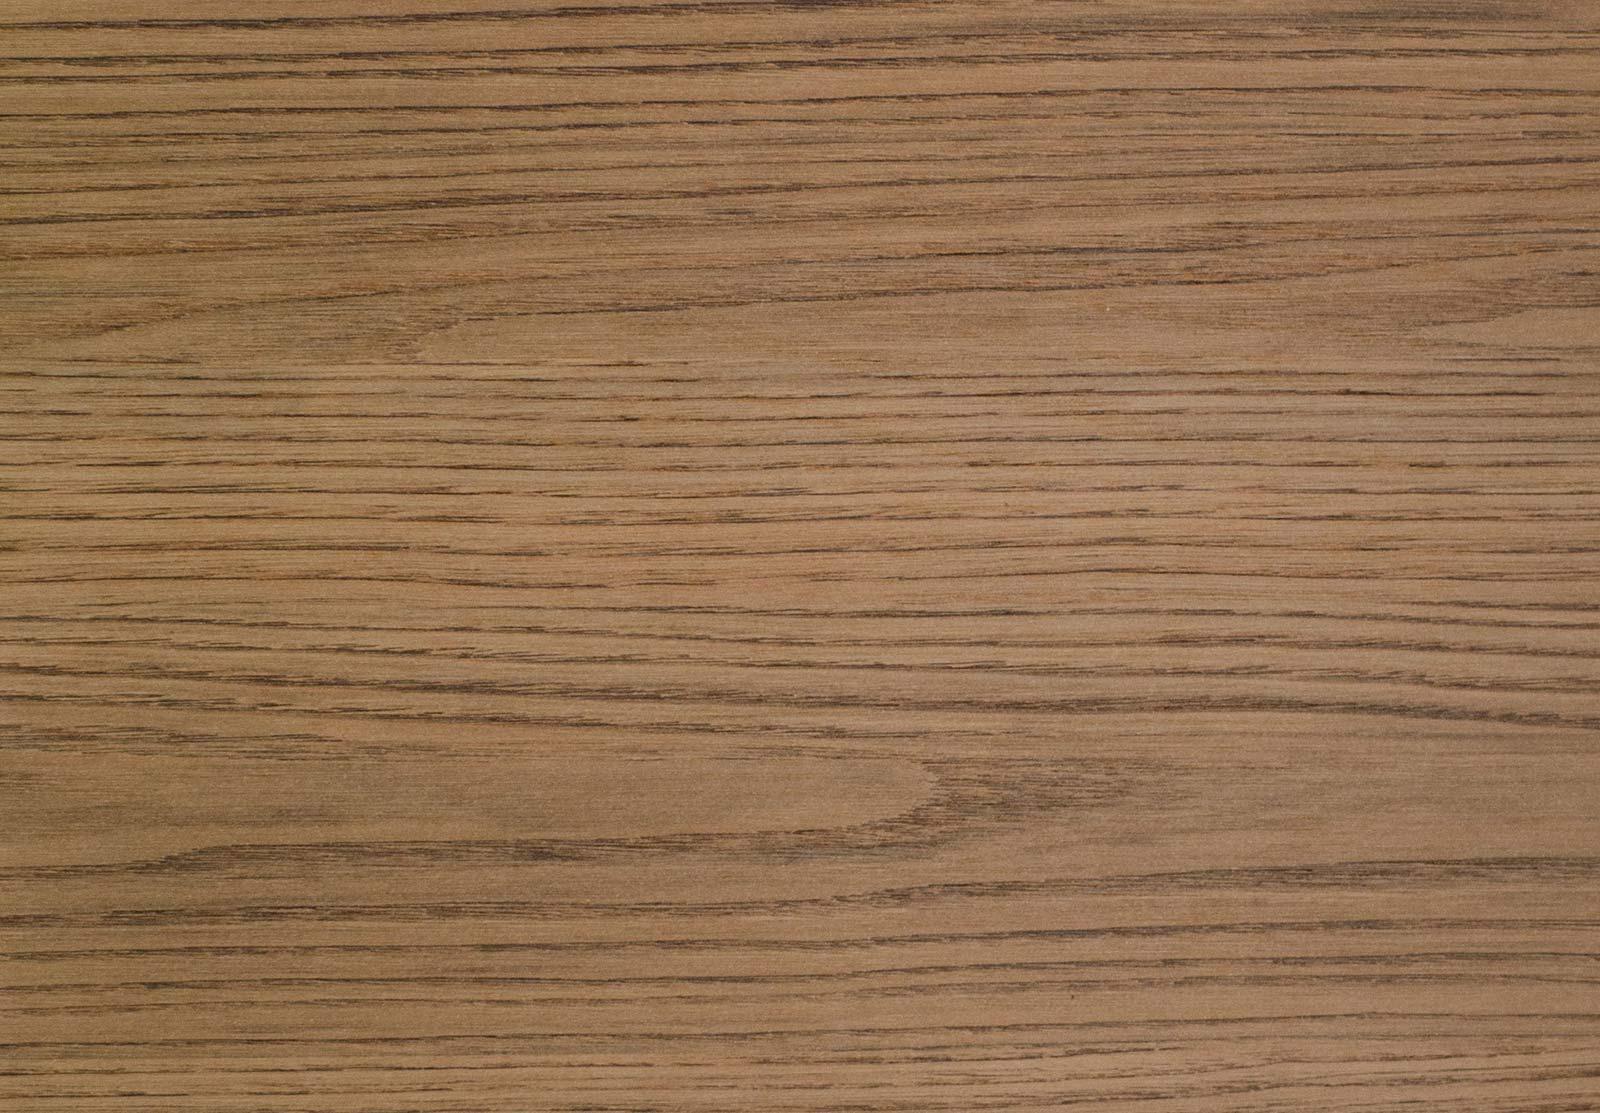 Pannelli alfawood - Olmo Scuro 9323